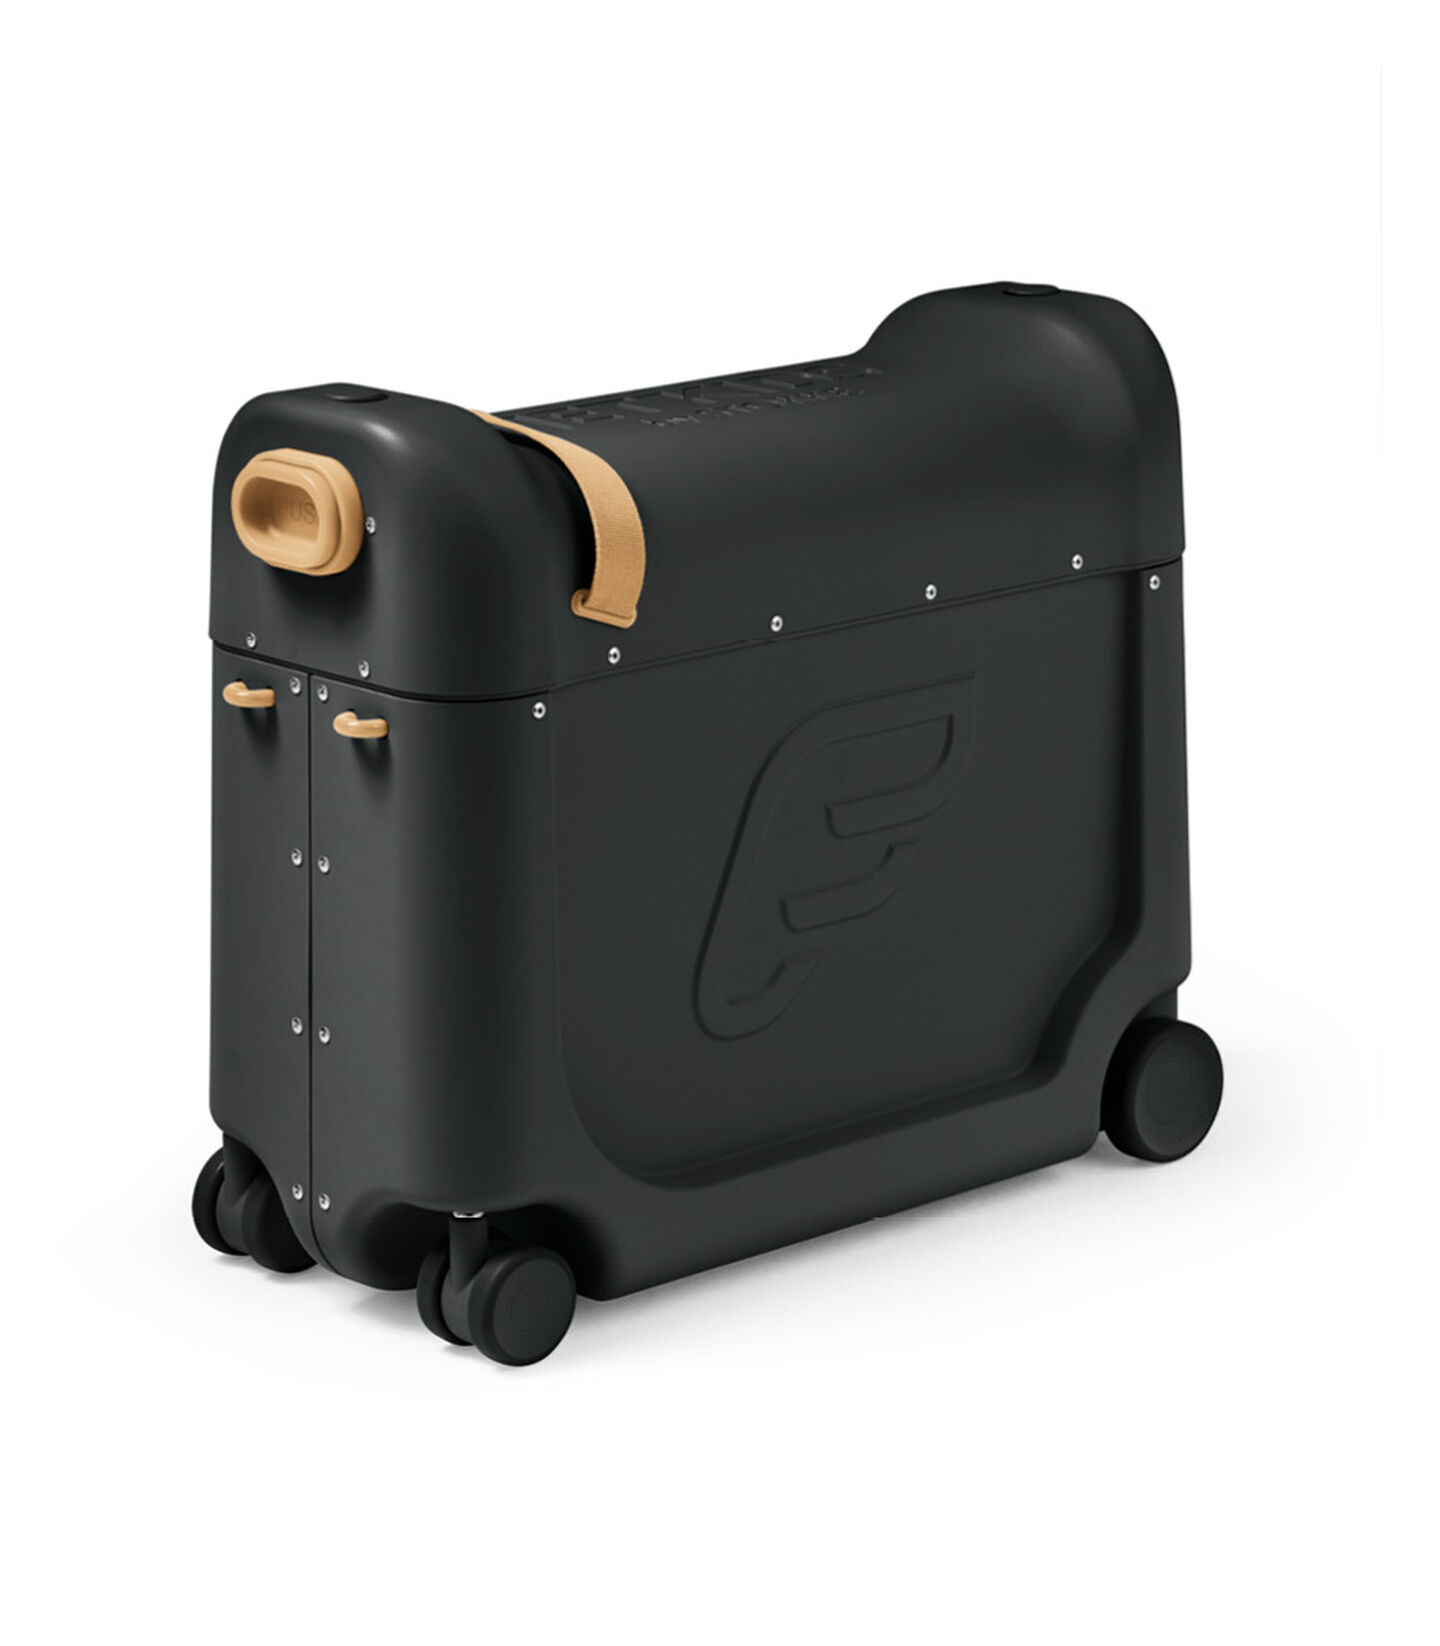 JetKids™ by Stokke® BedBox V3 in Lunar Eclipse Black. view 2